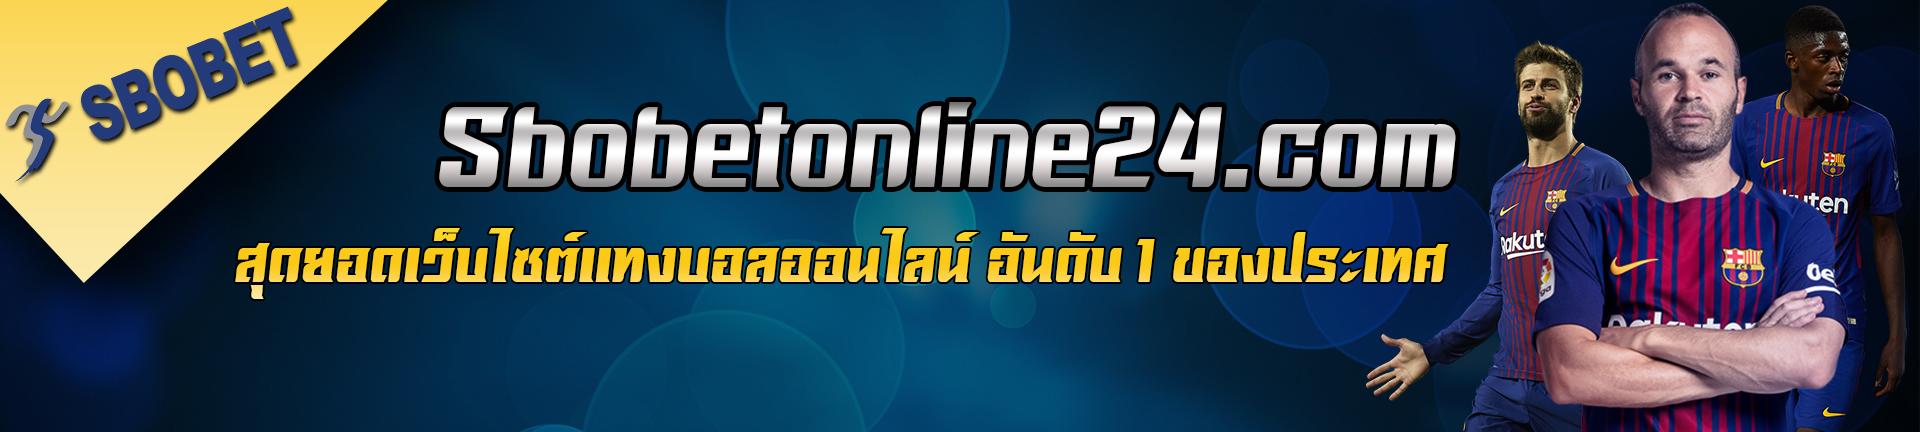 banner-sbobetonline24-use